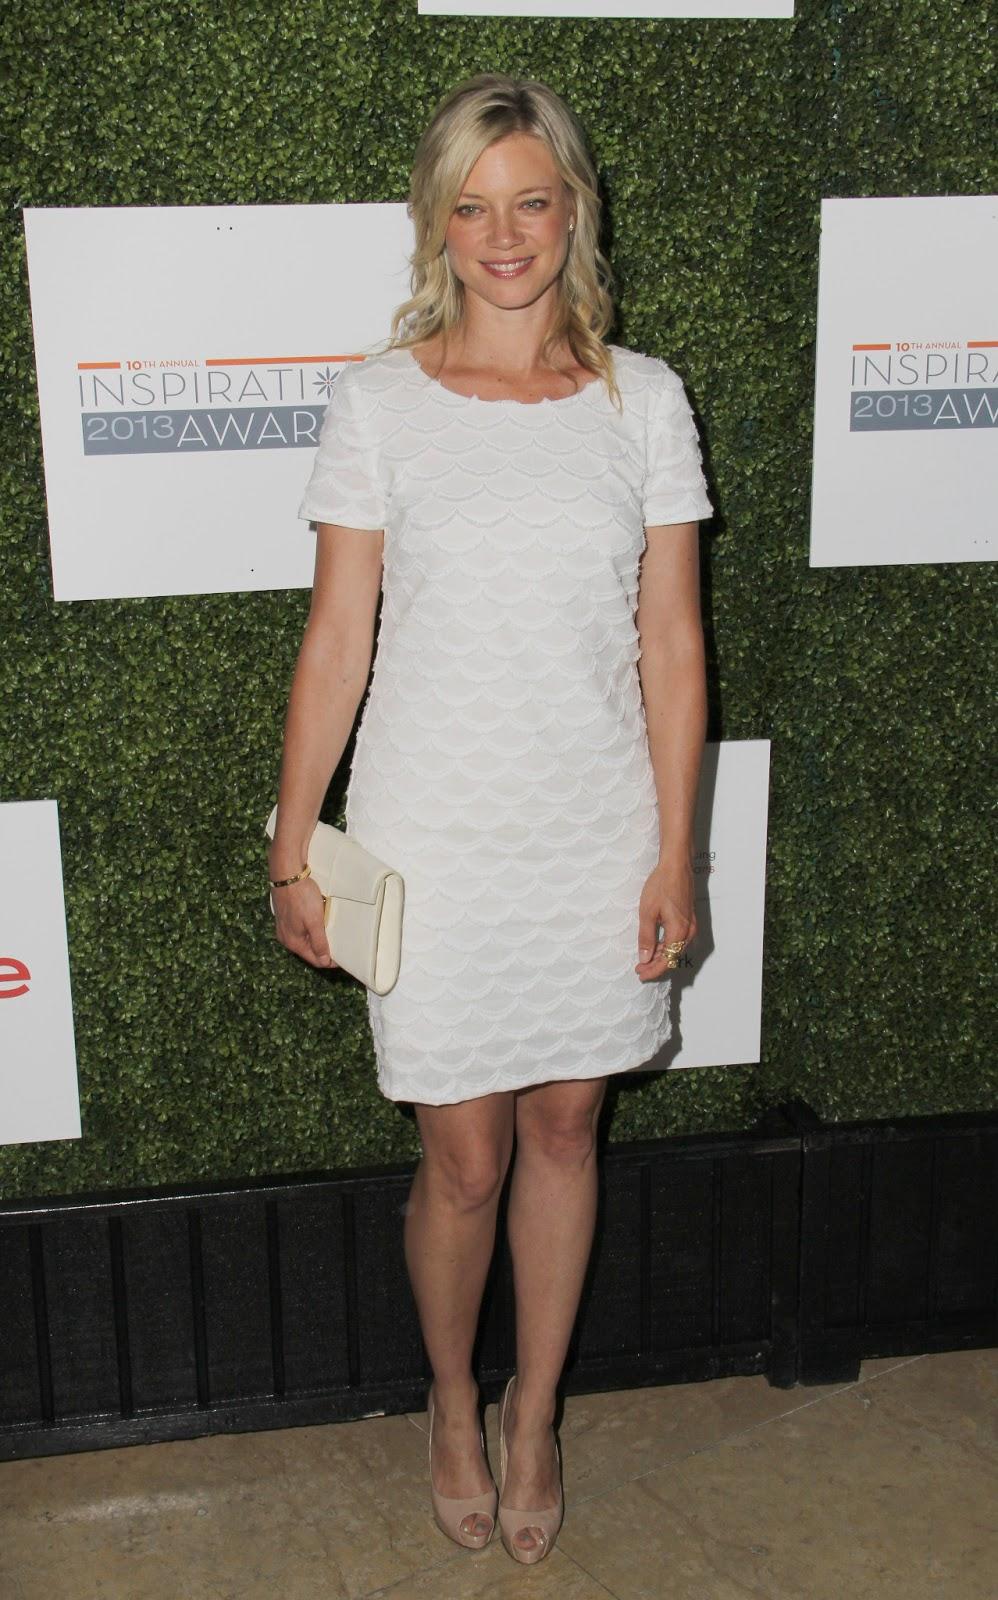 Celebrity Feet Close-up: Amy Smart Feet